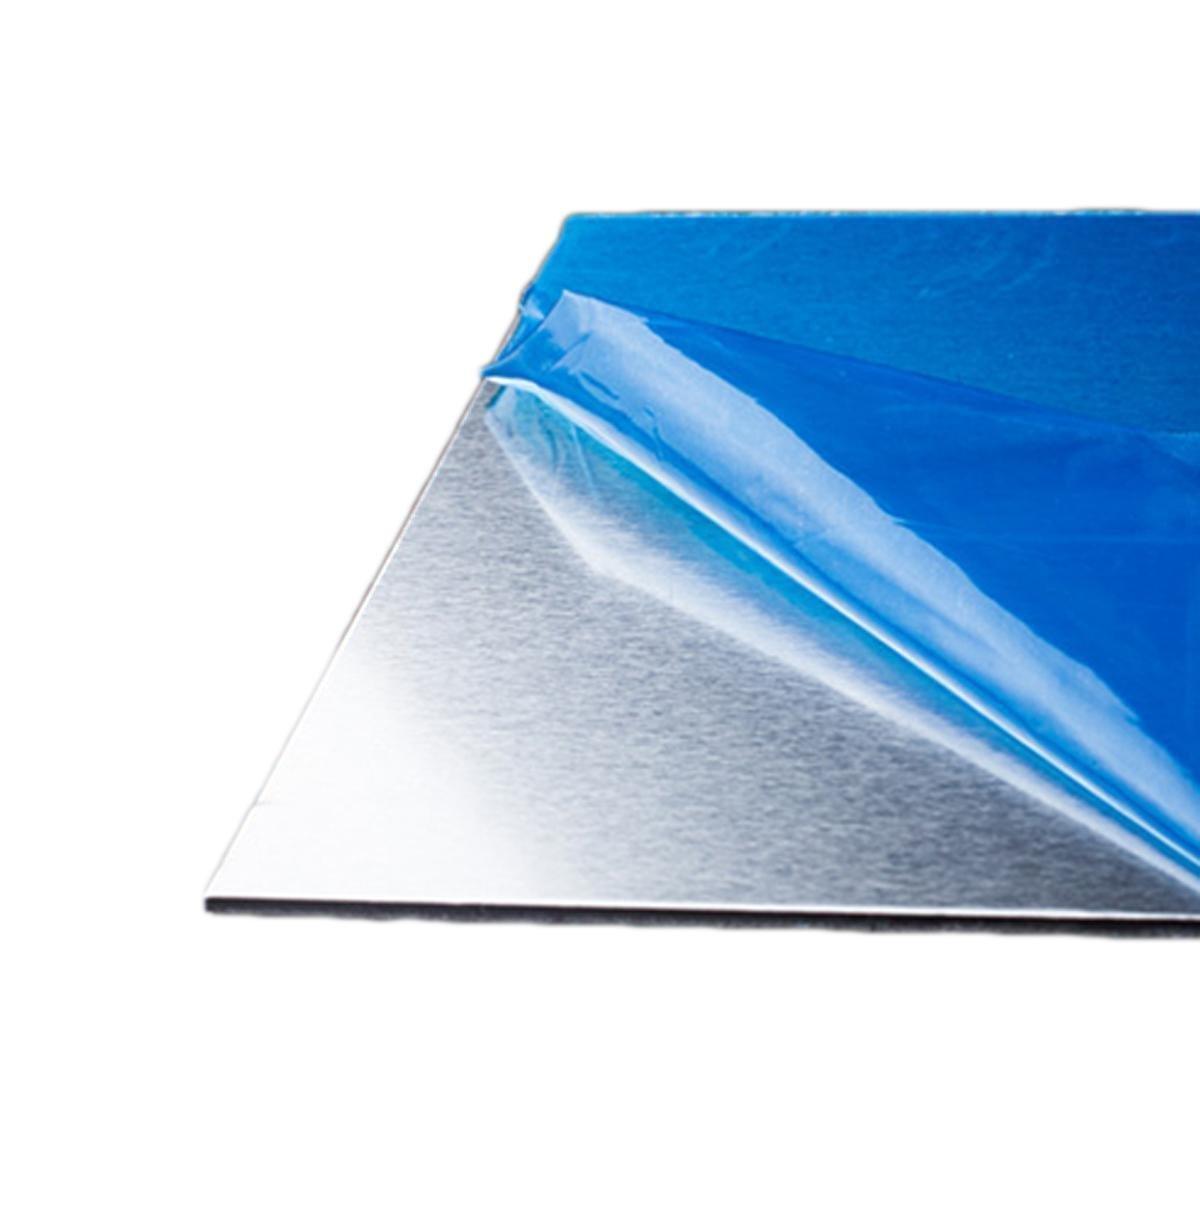 5052 Aluminum Sheet Metal Plate 250mm 2pcs 1.5mm250mm 9.84 9.84